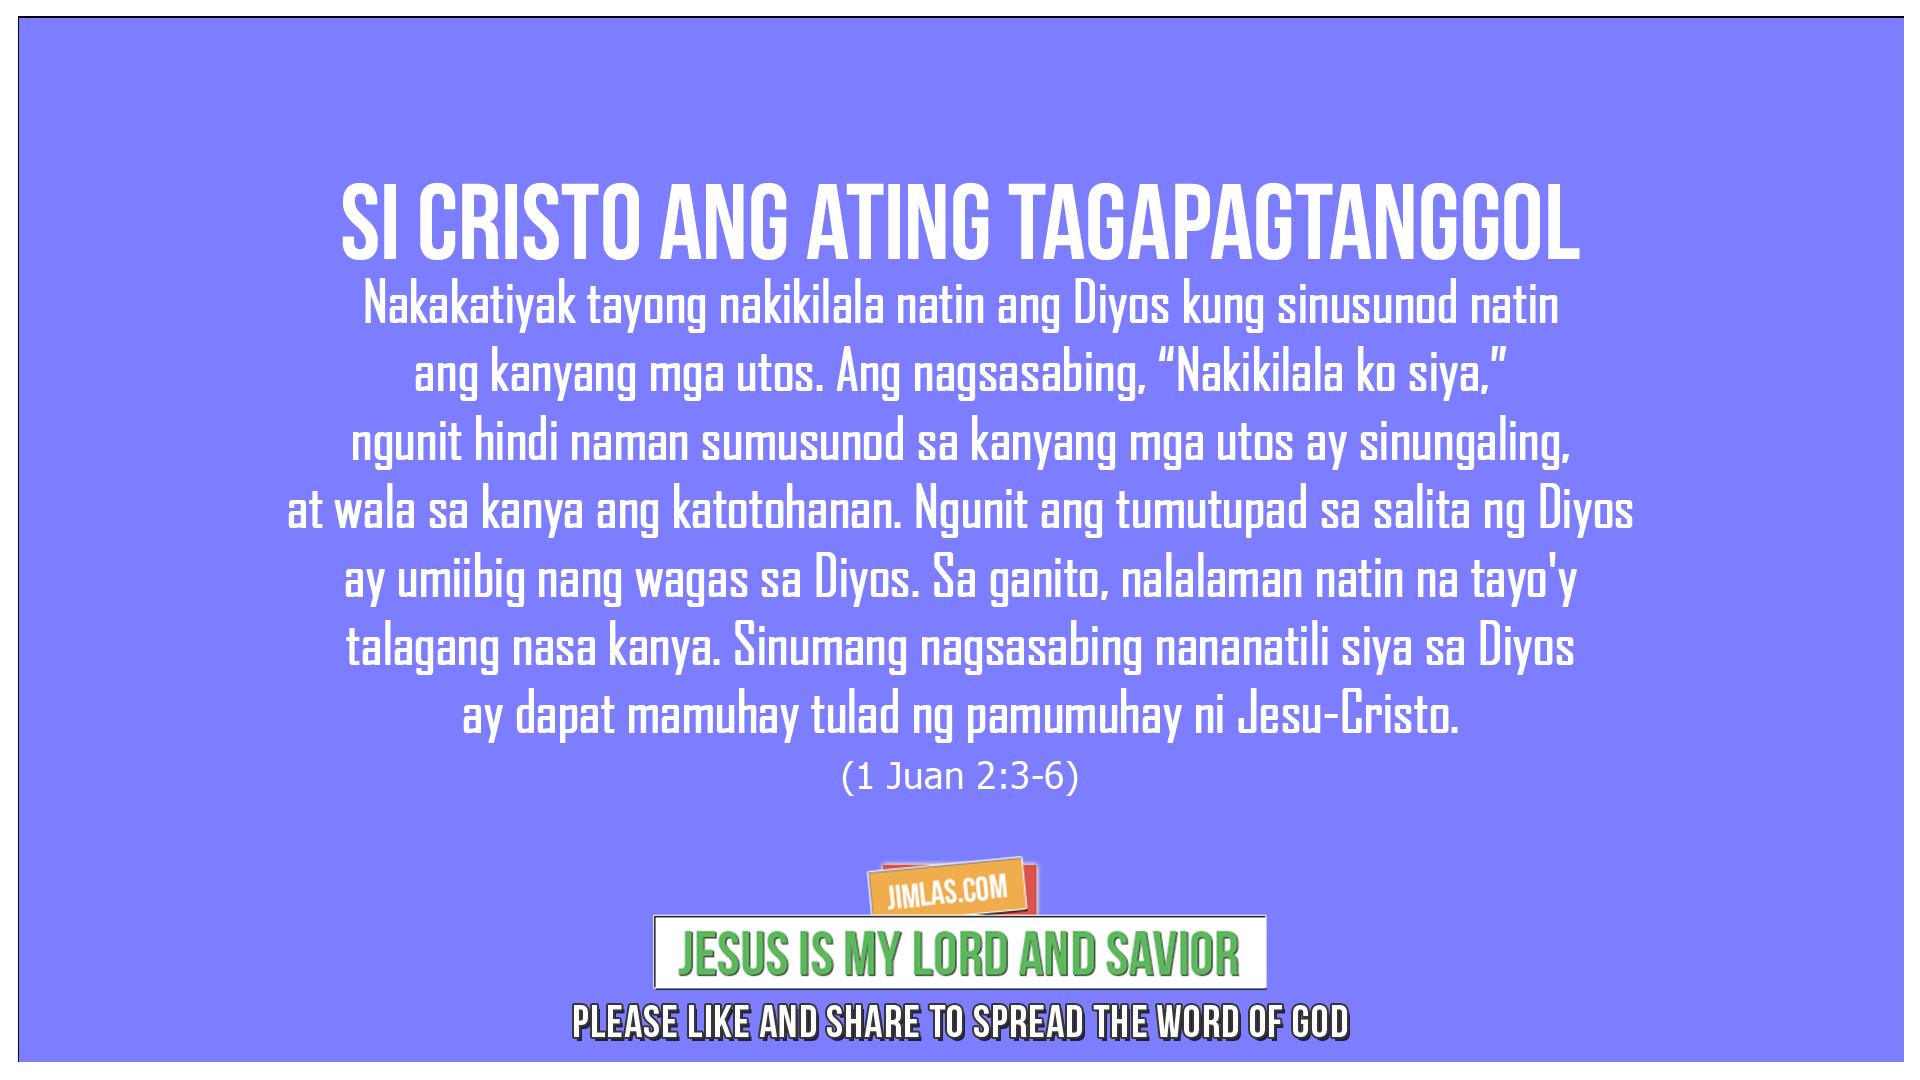 1 Juan 2:3-6, 1 Juan 2:3-6